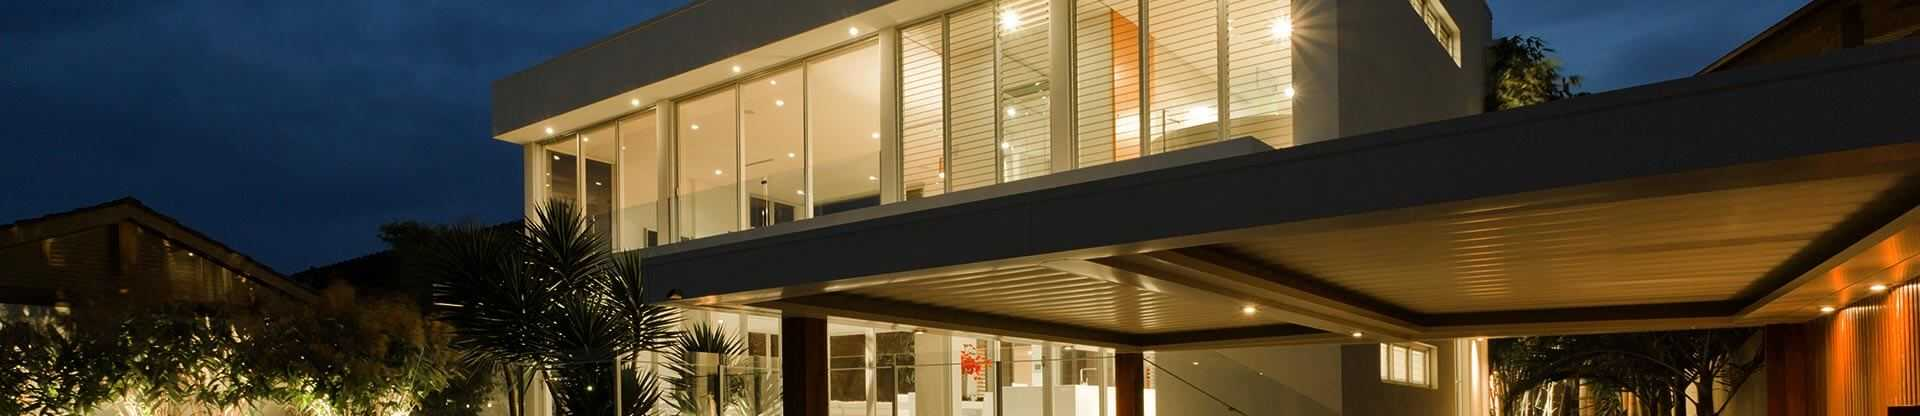 Nachmieter Finden Und Mietvertrag Kündigen Appler Wöhry Immobilien